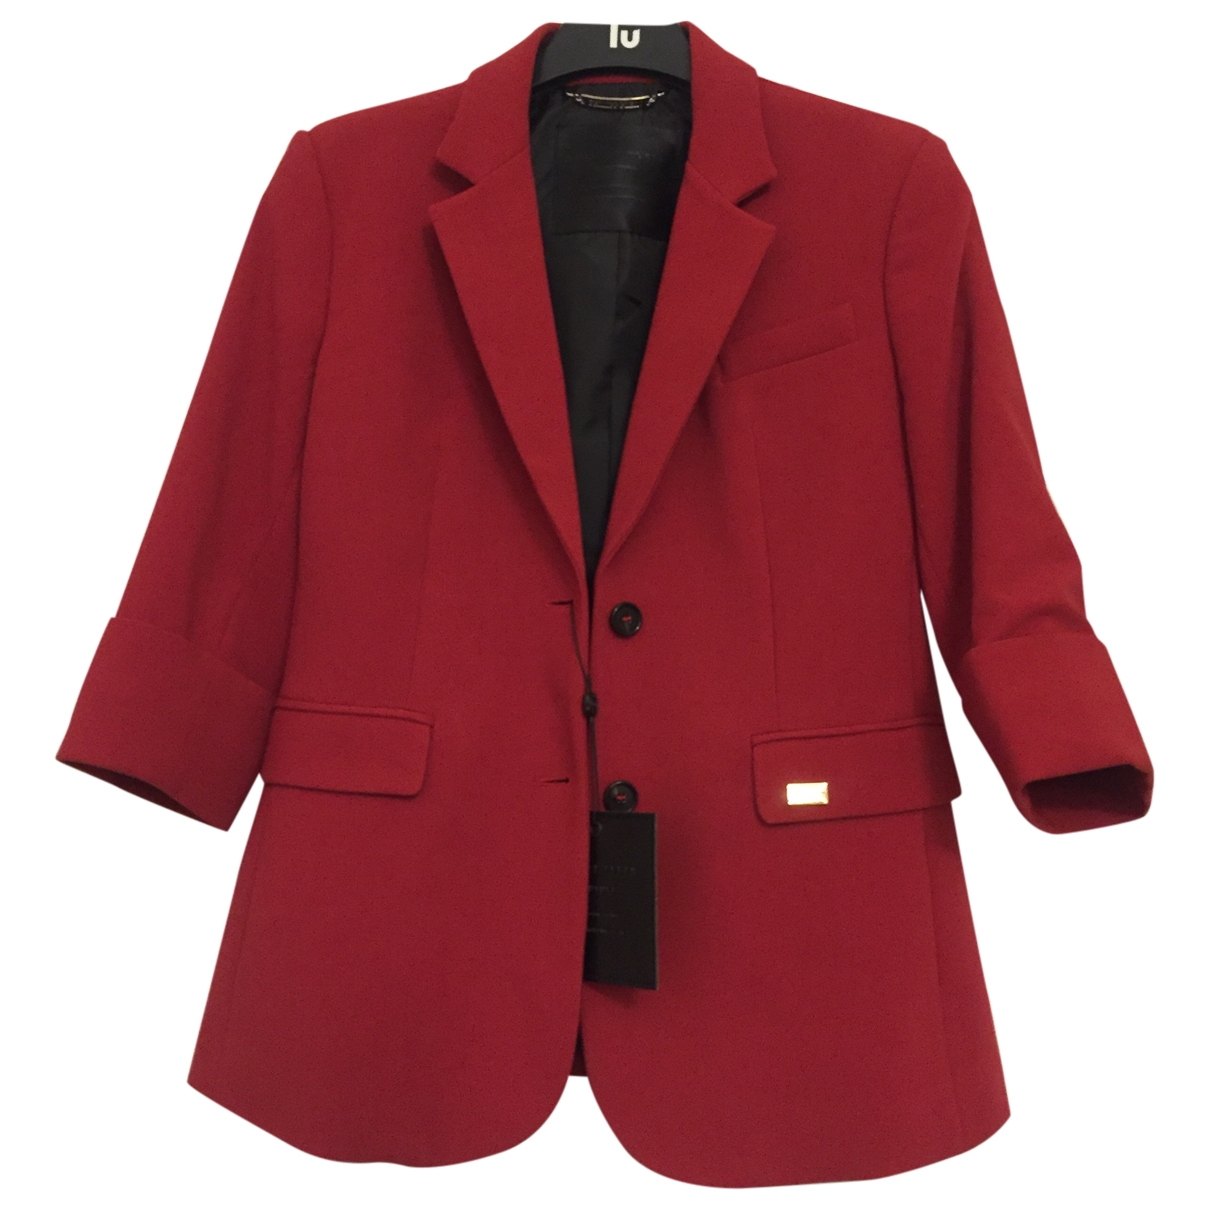 Philipp Plein \N Red Wool jacket for Women 36 FR